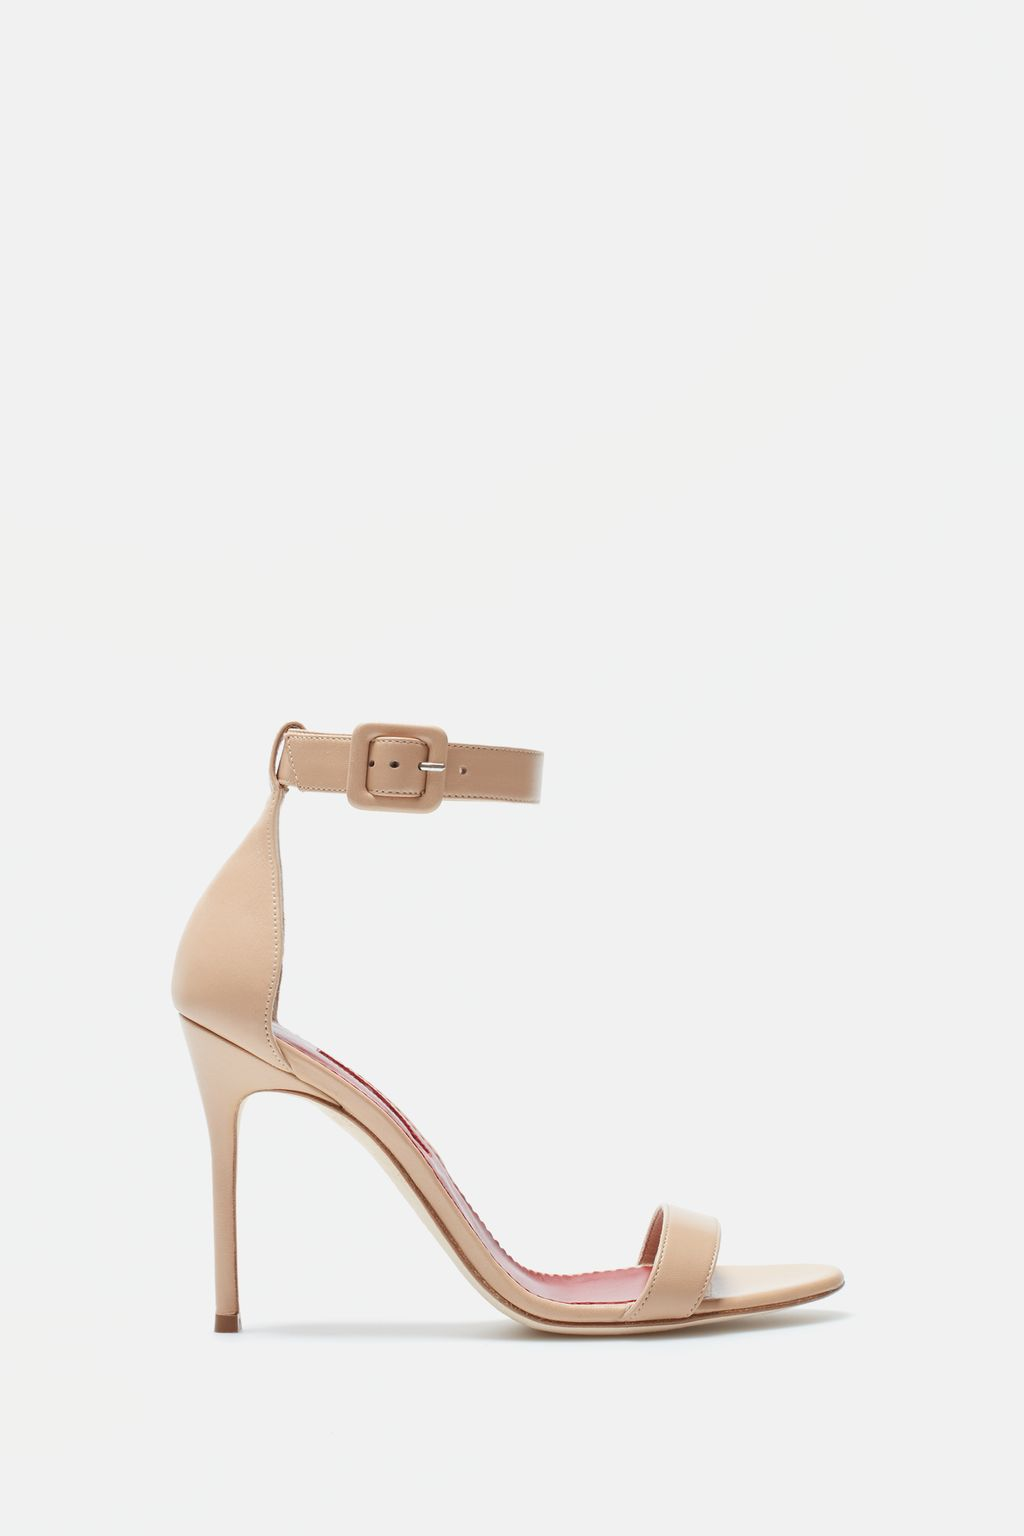 Napa leather sandals